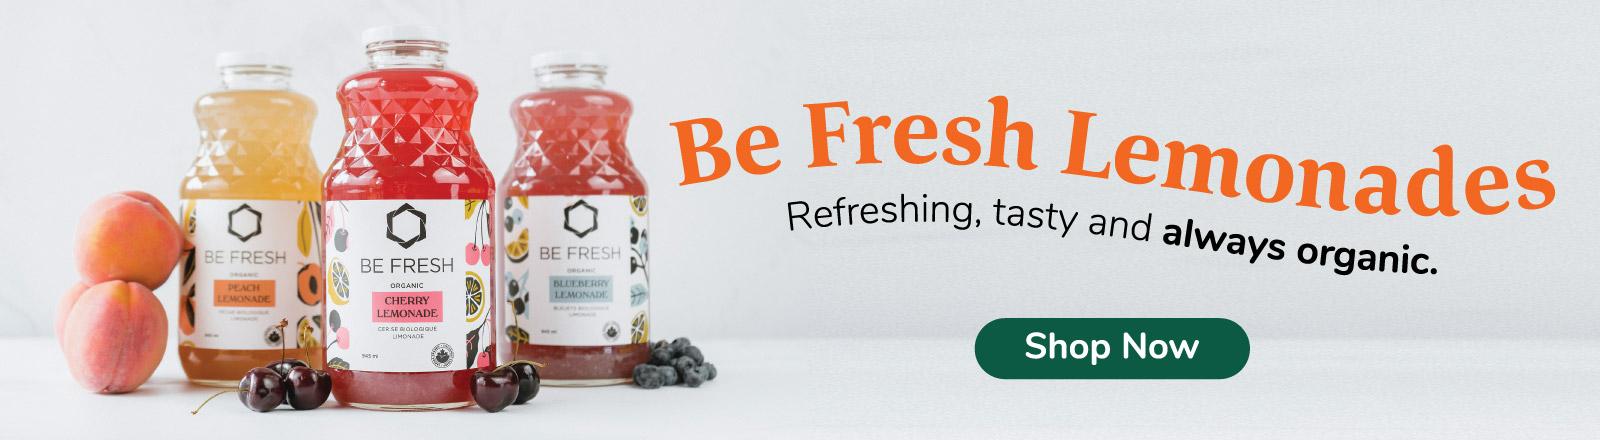 Be Fresh Lemonades - Refreshing tasty and always organic